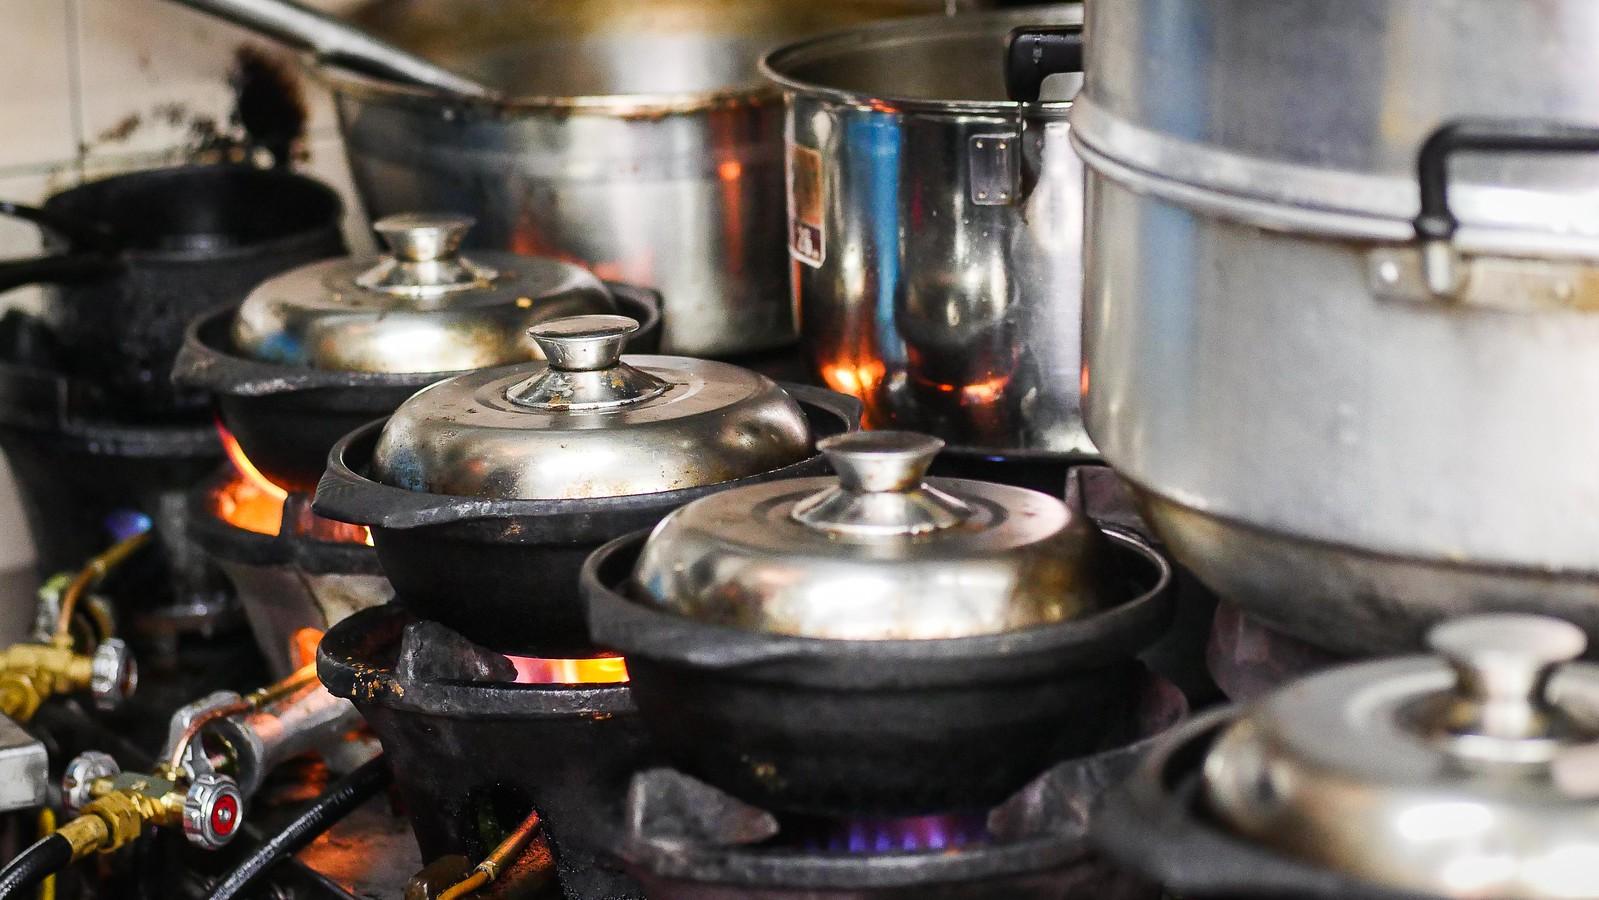 claypot cooking